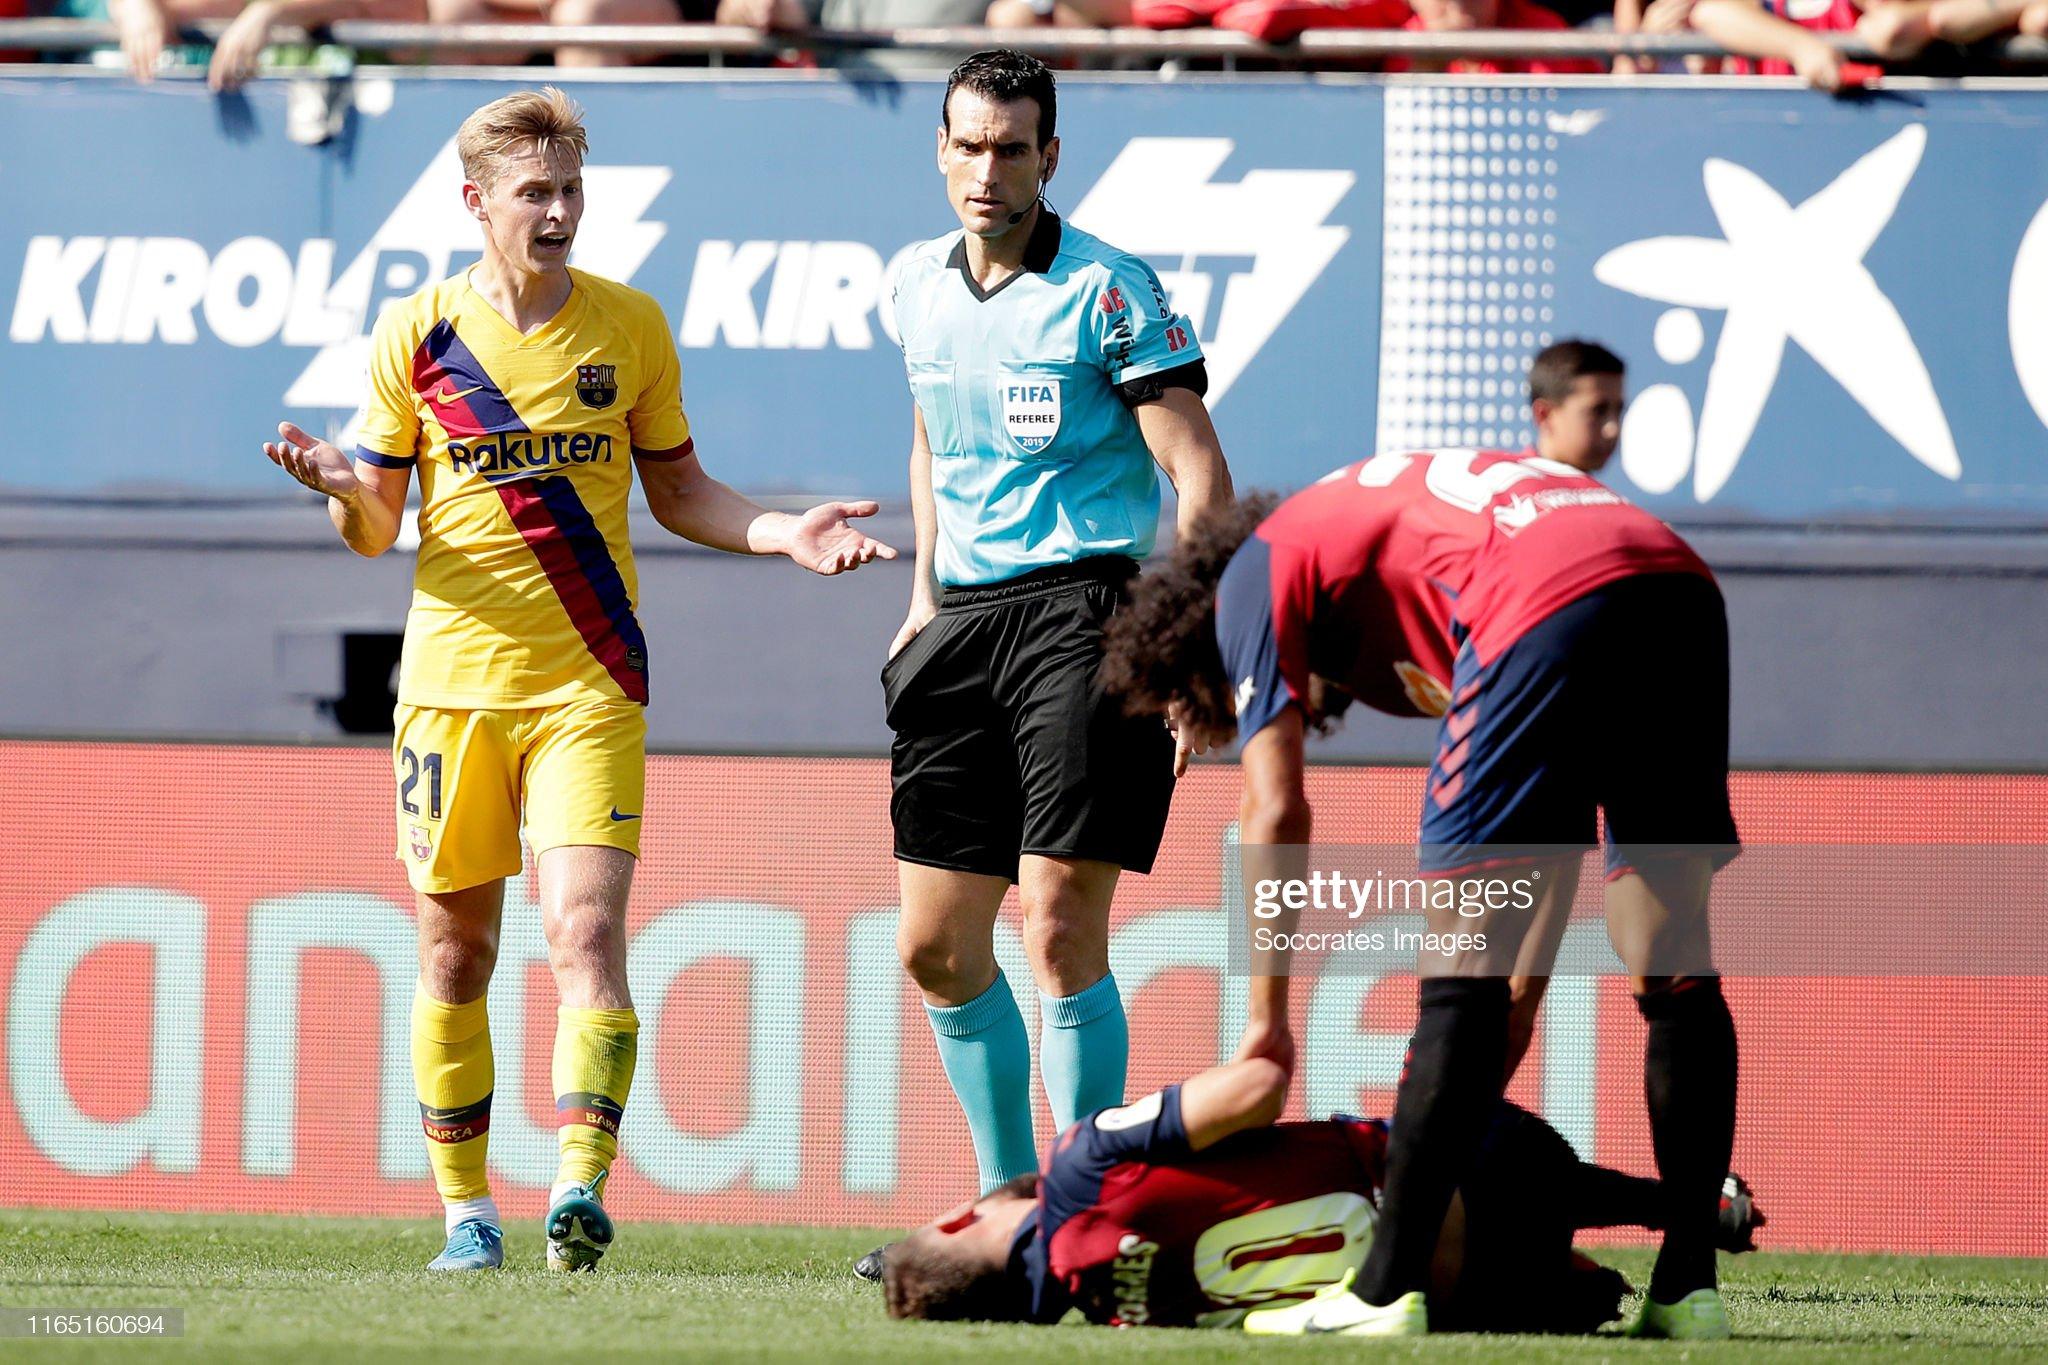 صور مباراة : أوساسونا - برشلونة 2-2 ( 31-08-2019 )  Frenkie-de-jong-of-fc-barcelona-during-the-la-liga-santander-match-picture-id1165160694?s=2048x2048